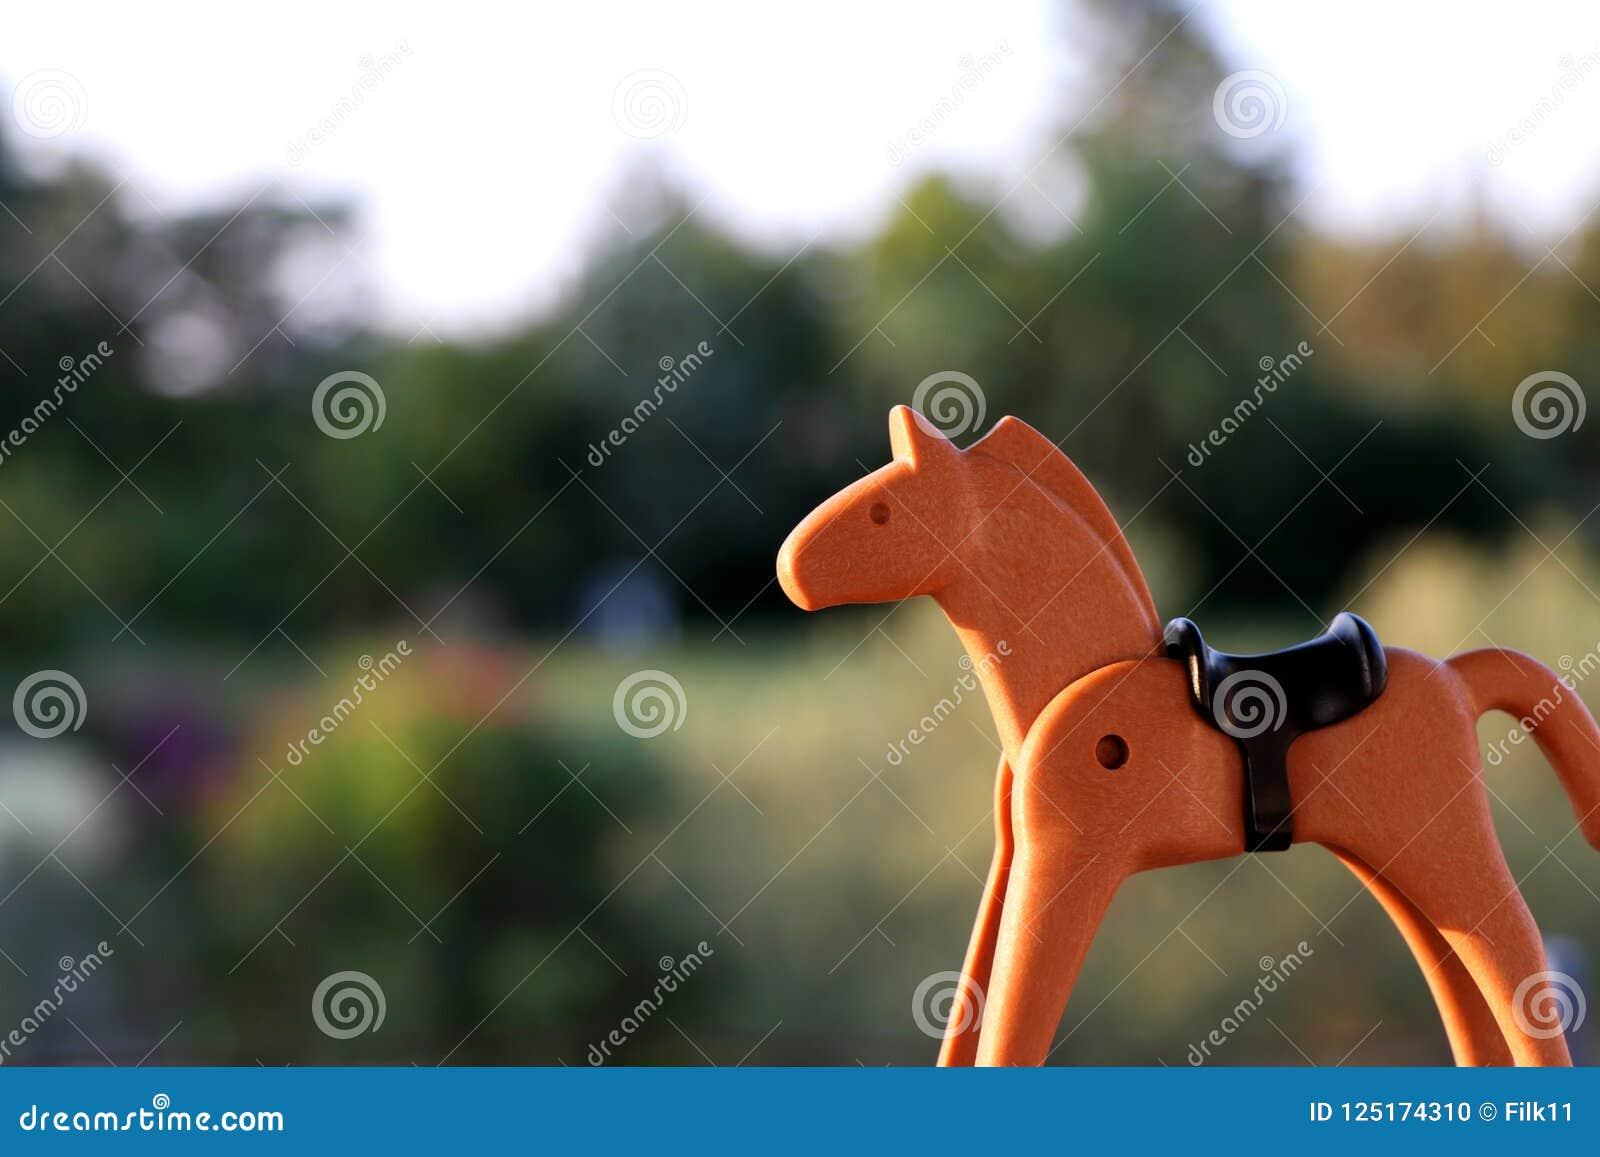 Thessaloniki, Greece - September 2 2018: Brown horse, playmobil figure